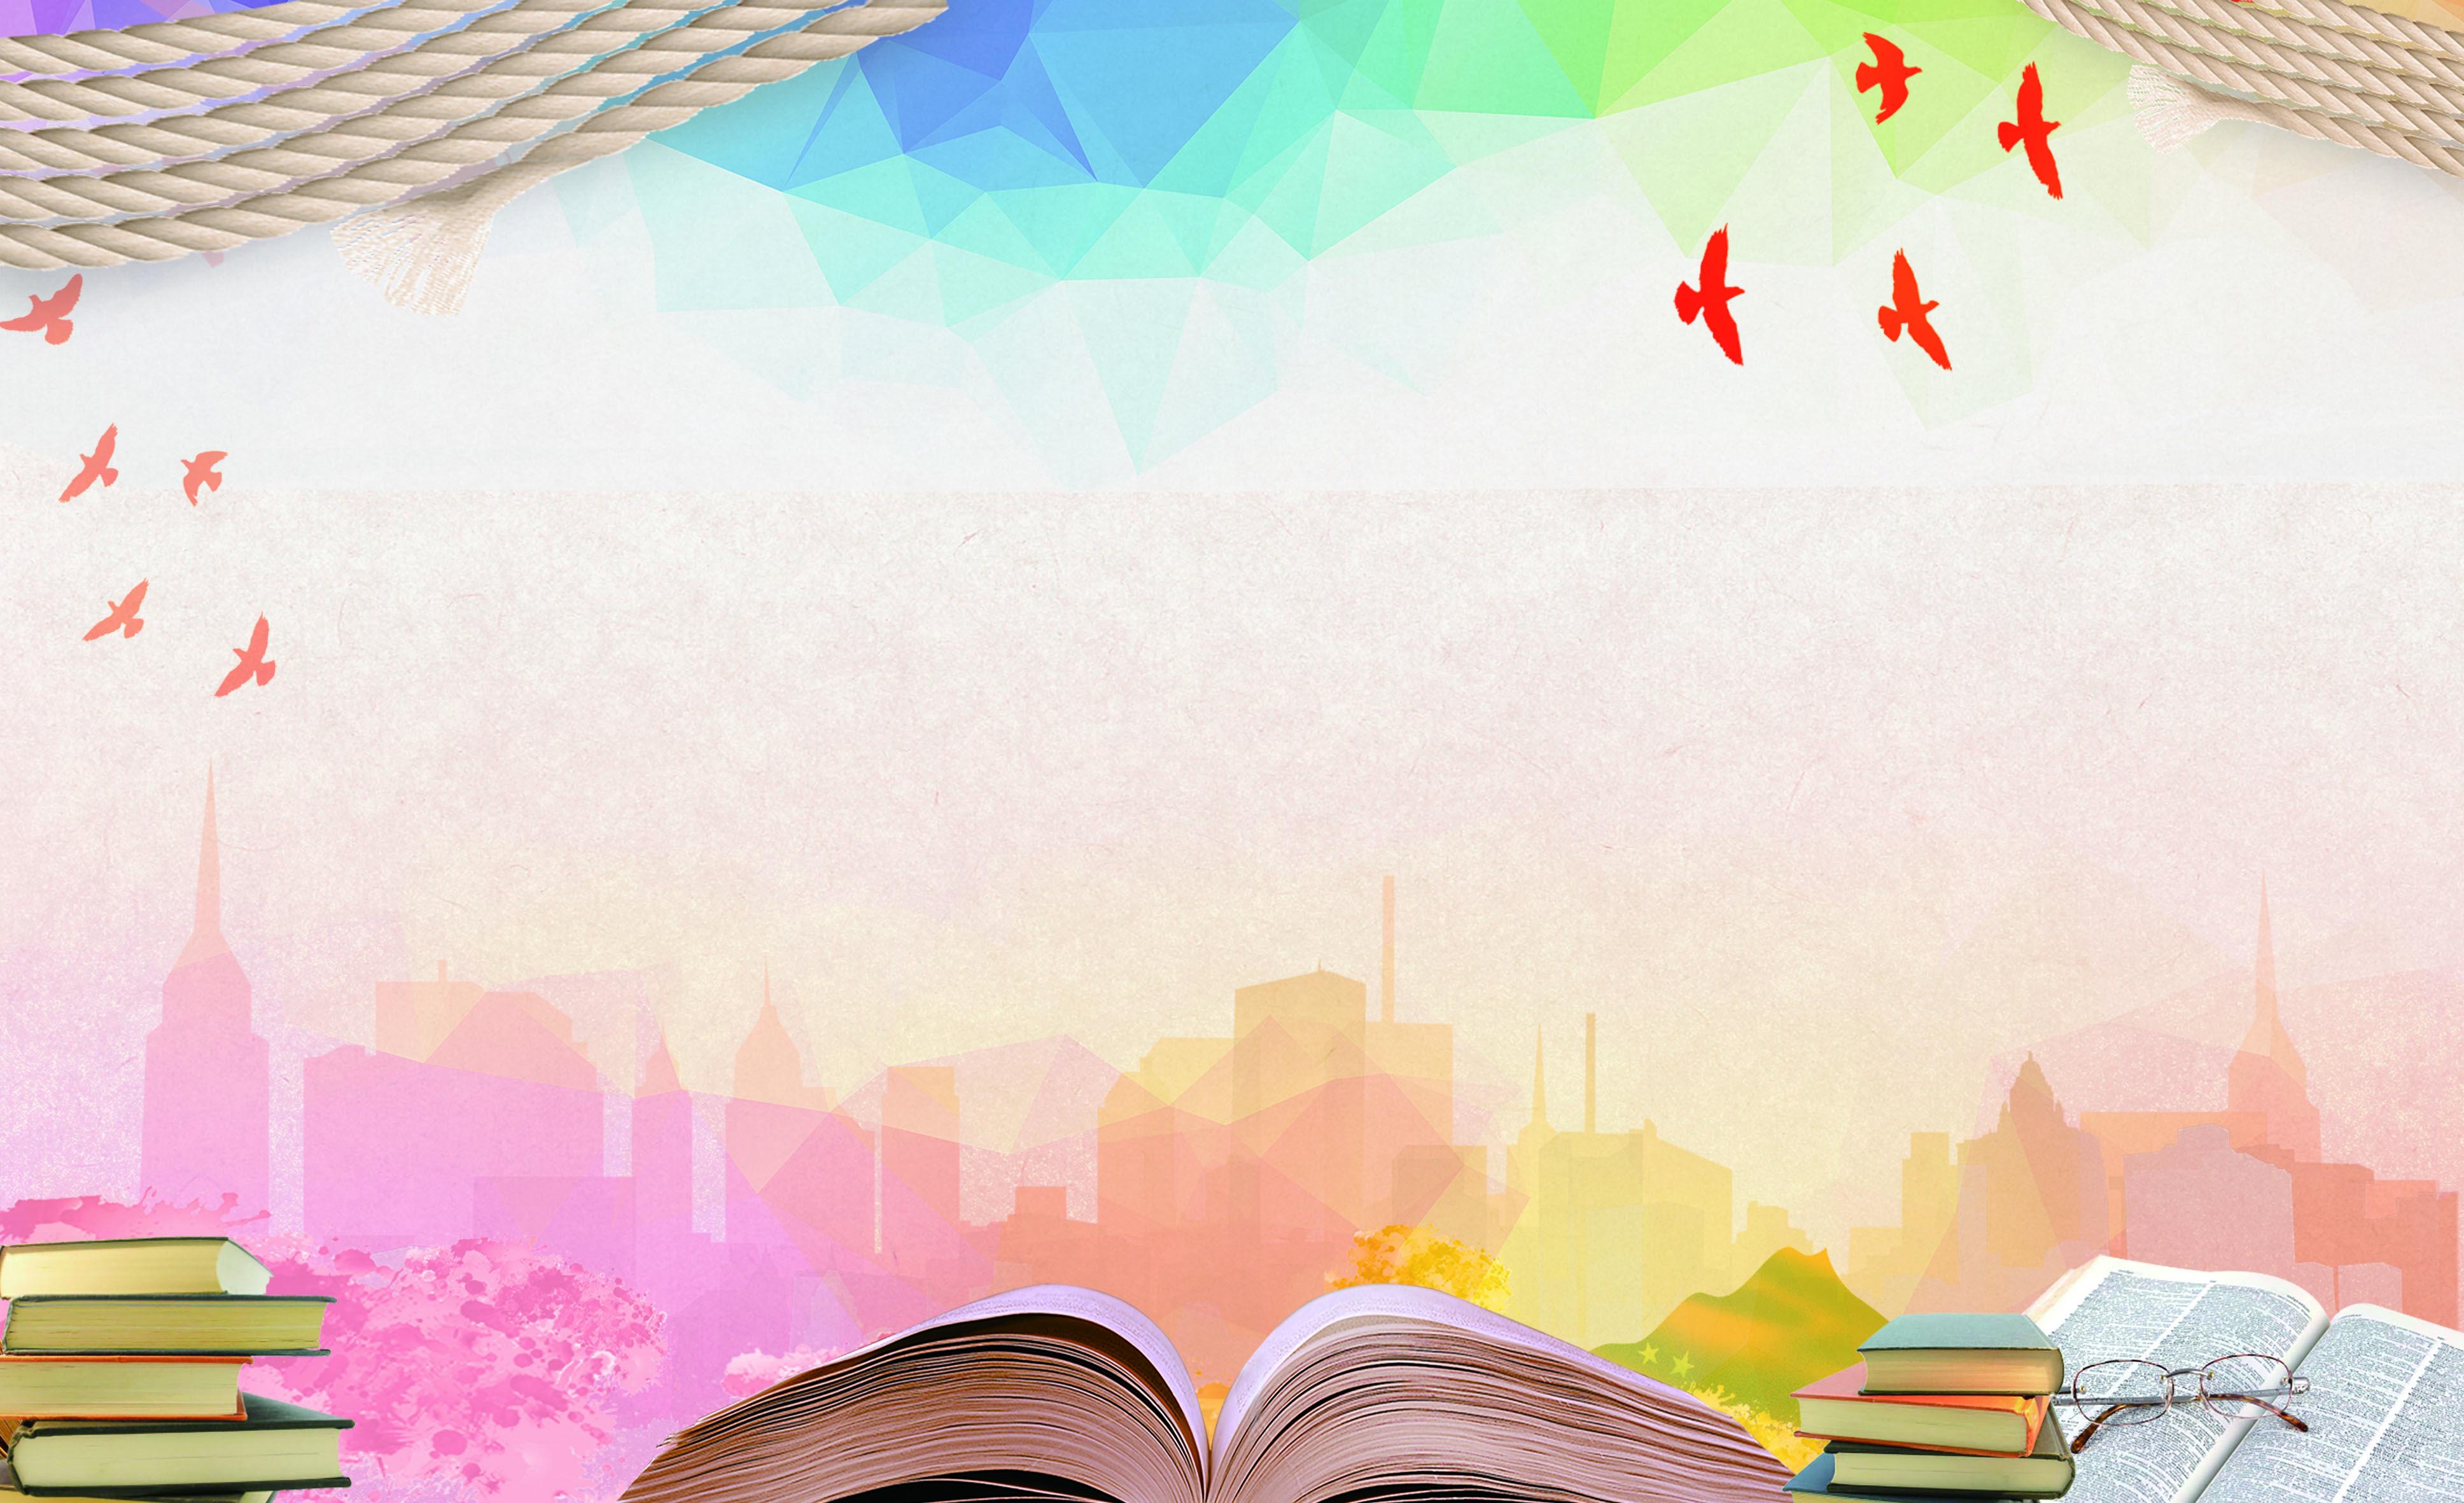 Summer School Reading And Learning Poster Background Ilustrasi Buku Ilustrasi Desain Banner